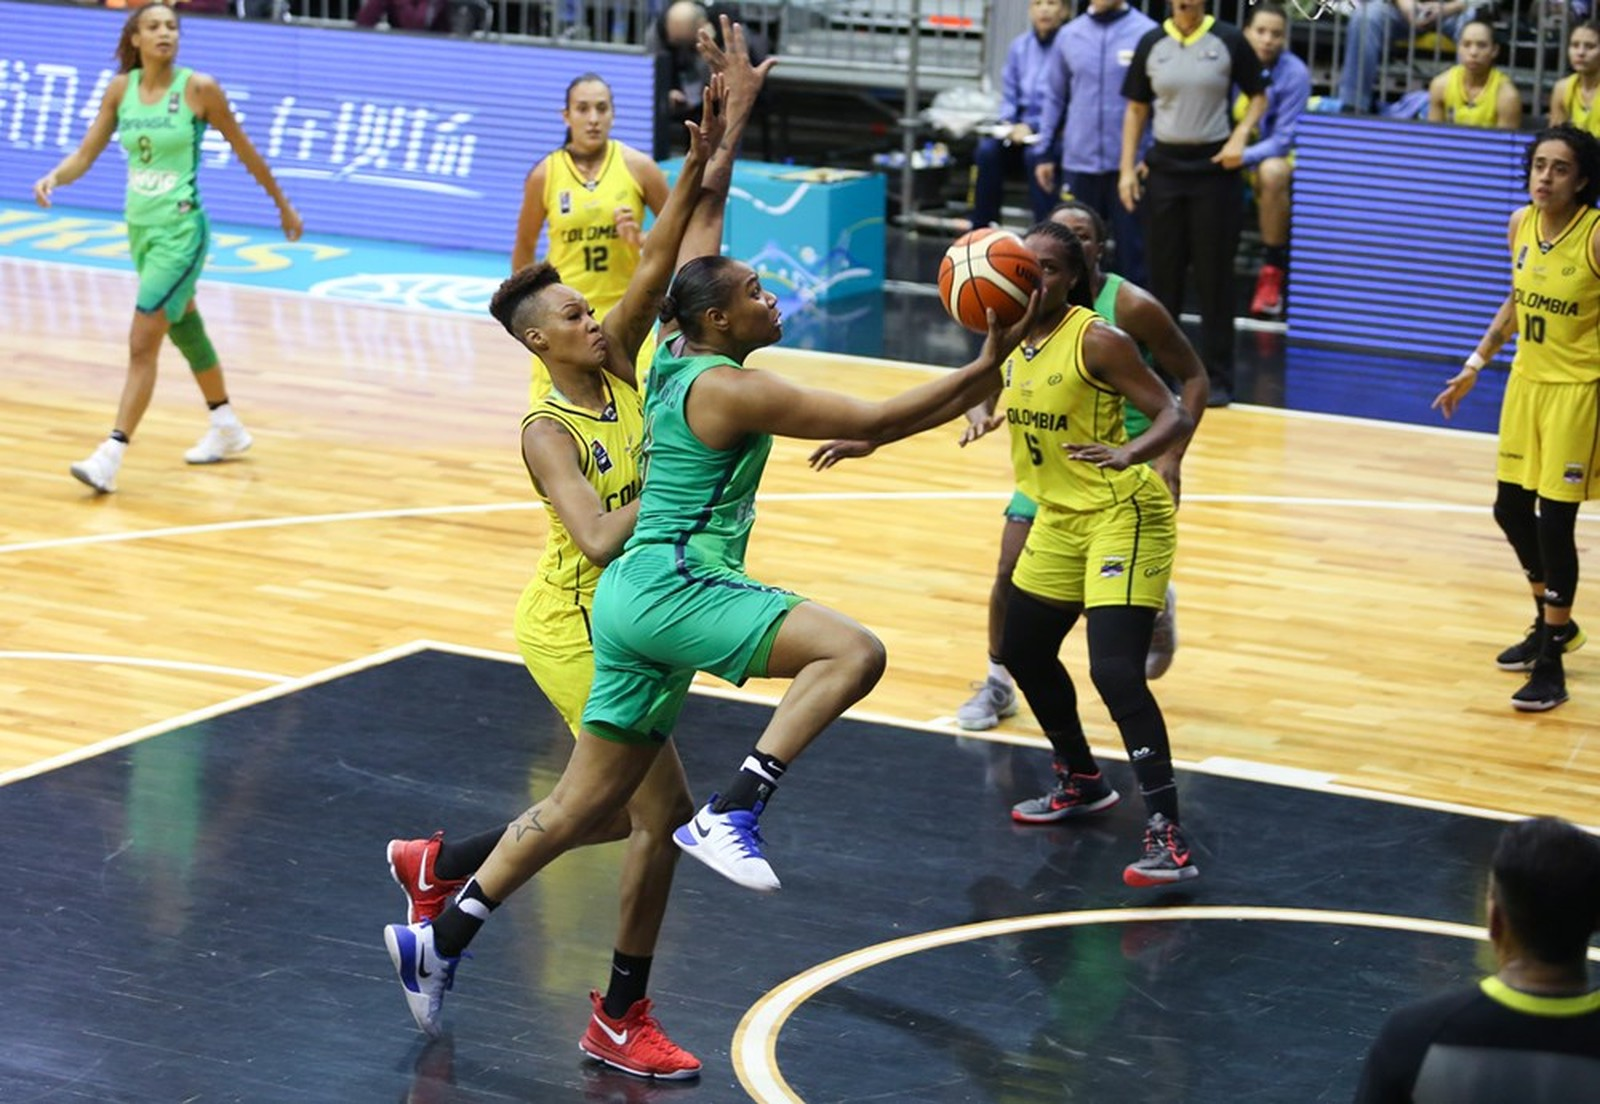 Brasil se impõe, vence fácil a Colômbia e lidera grupo na AmeriCup feminina